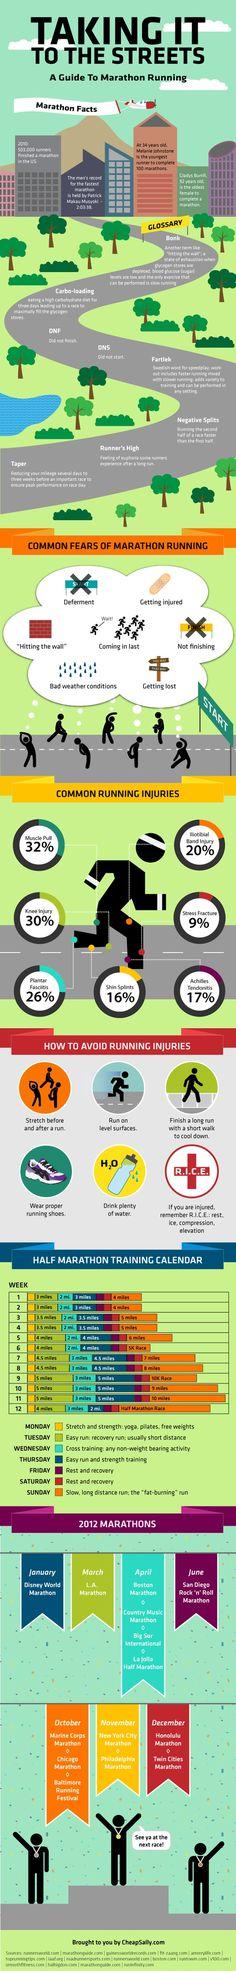 Marathon/Half Marathon Training